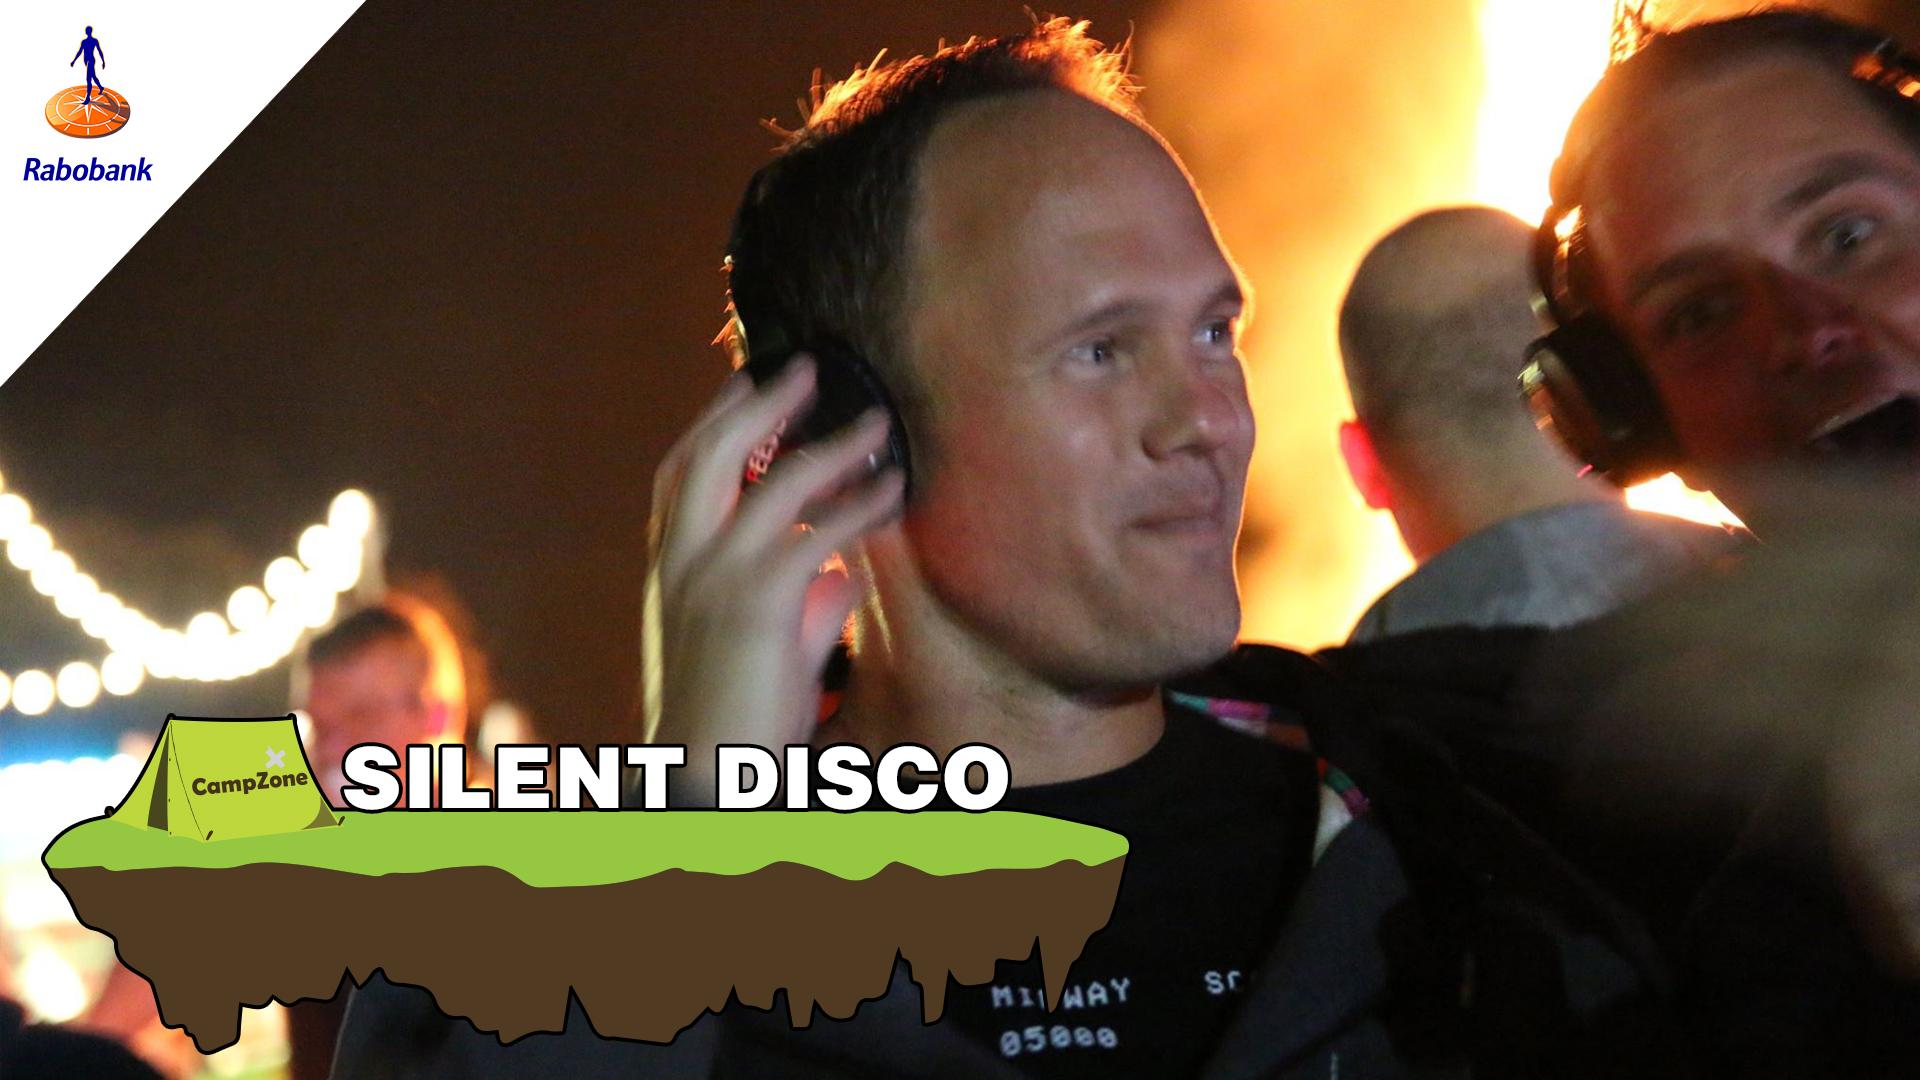 22.00 - Silent Disco